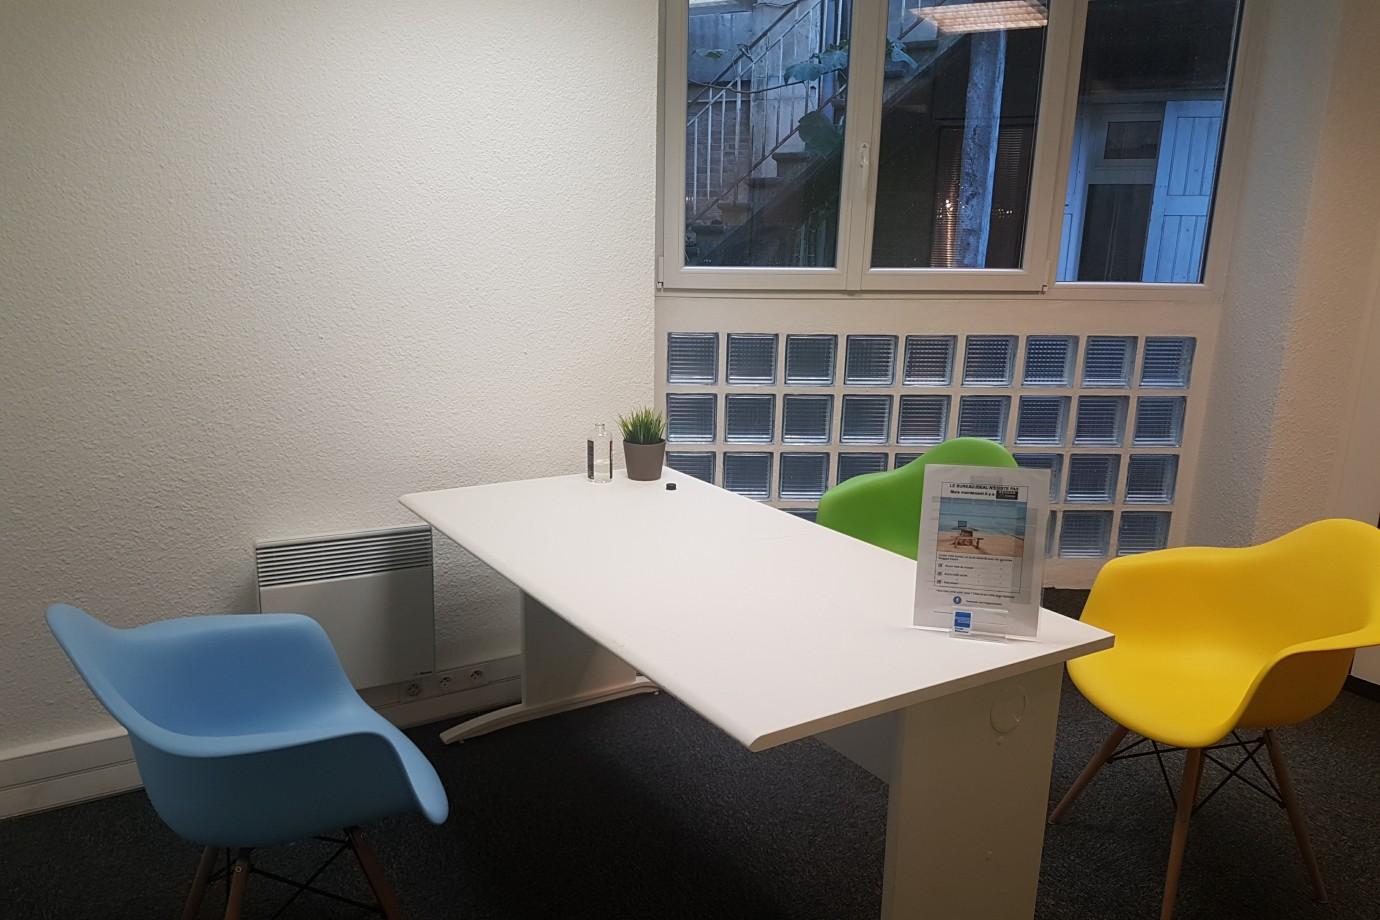 Private Office Grenoble Bureau 1 Poste Choose Work